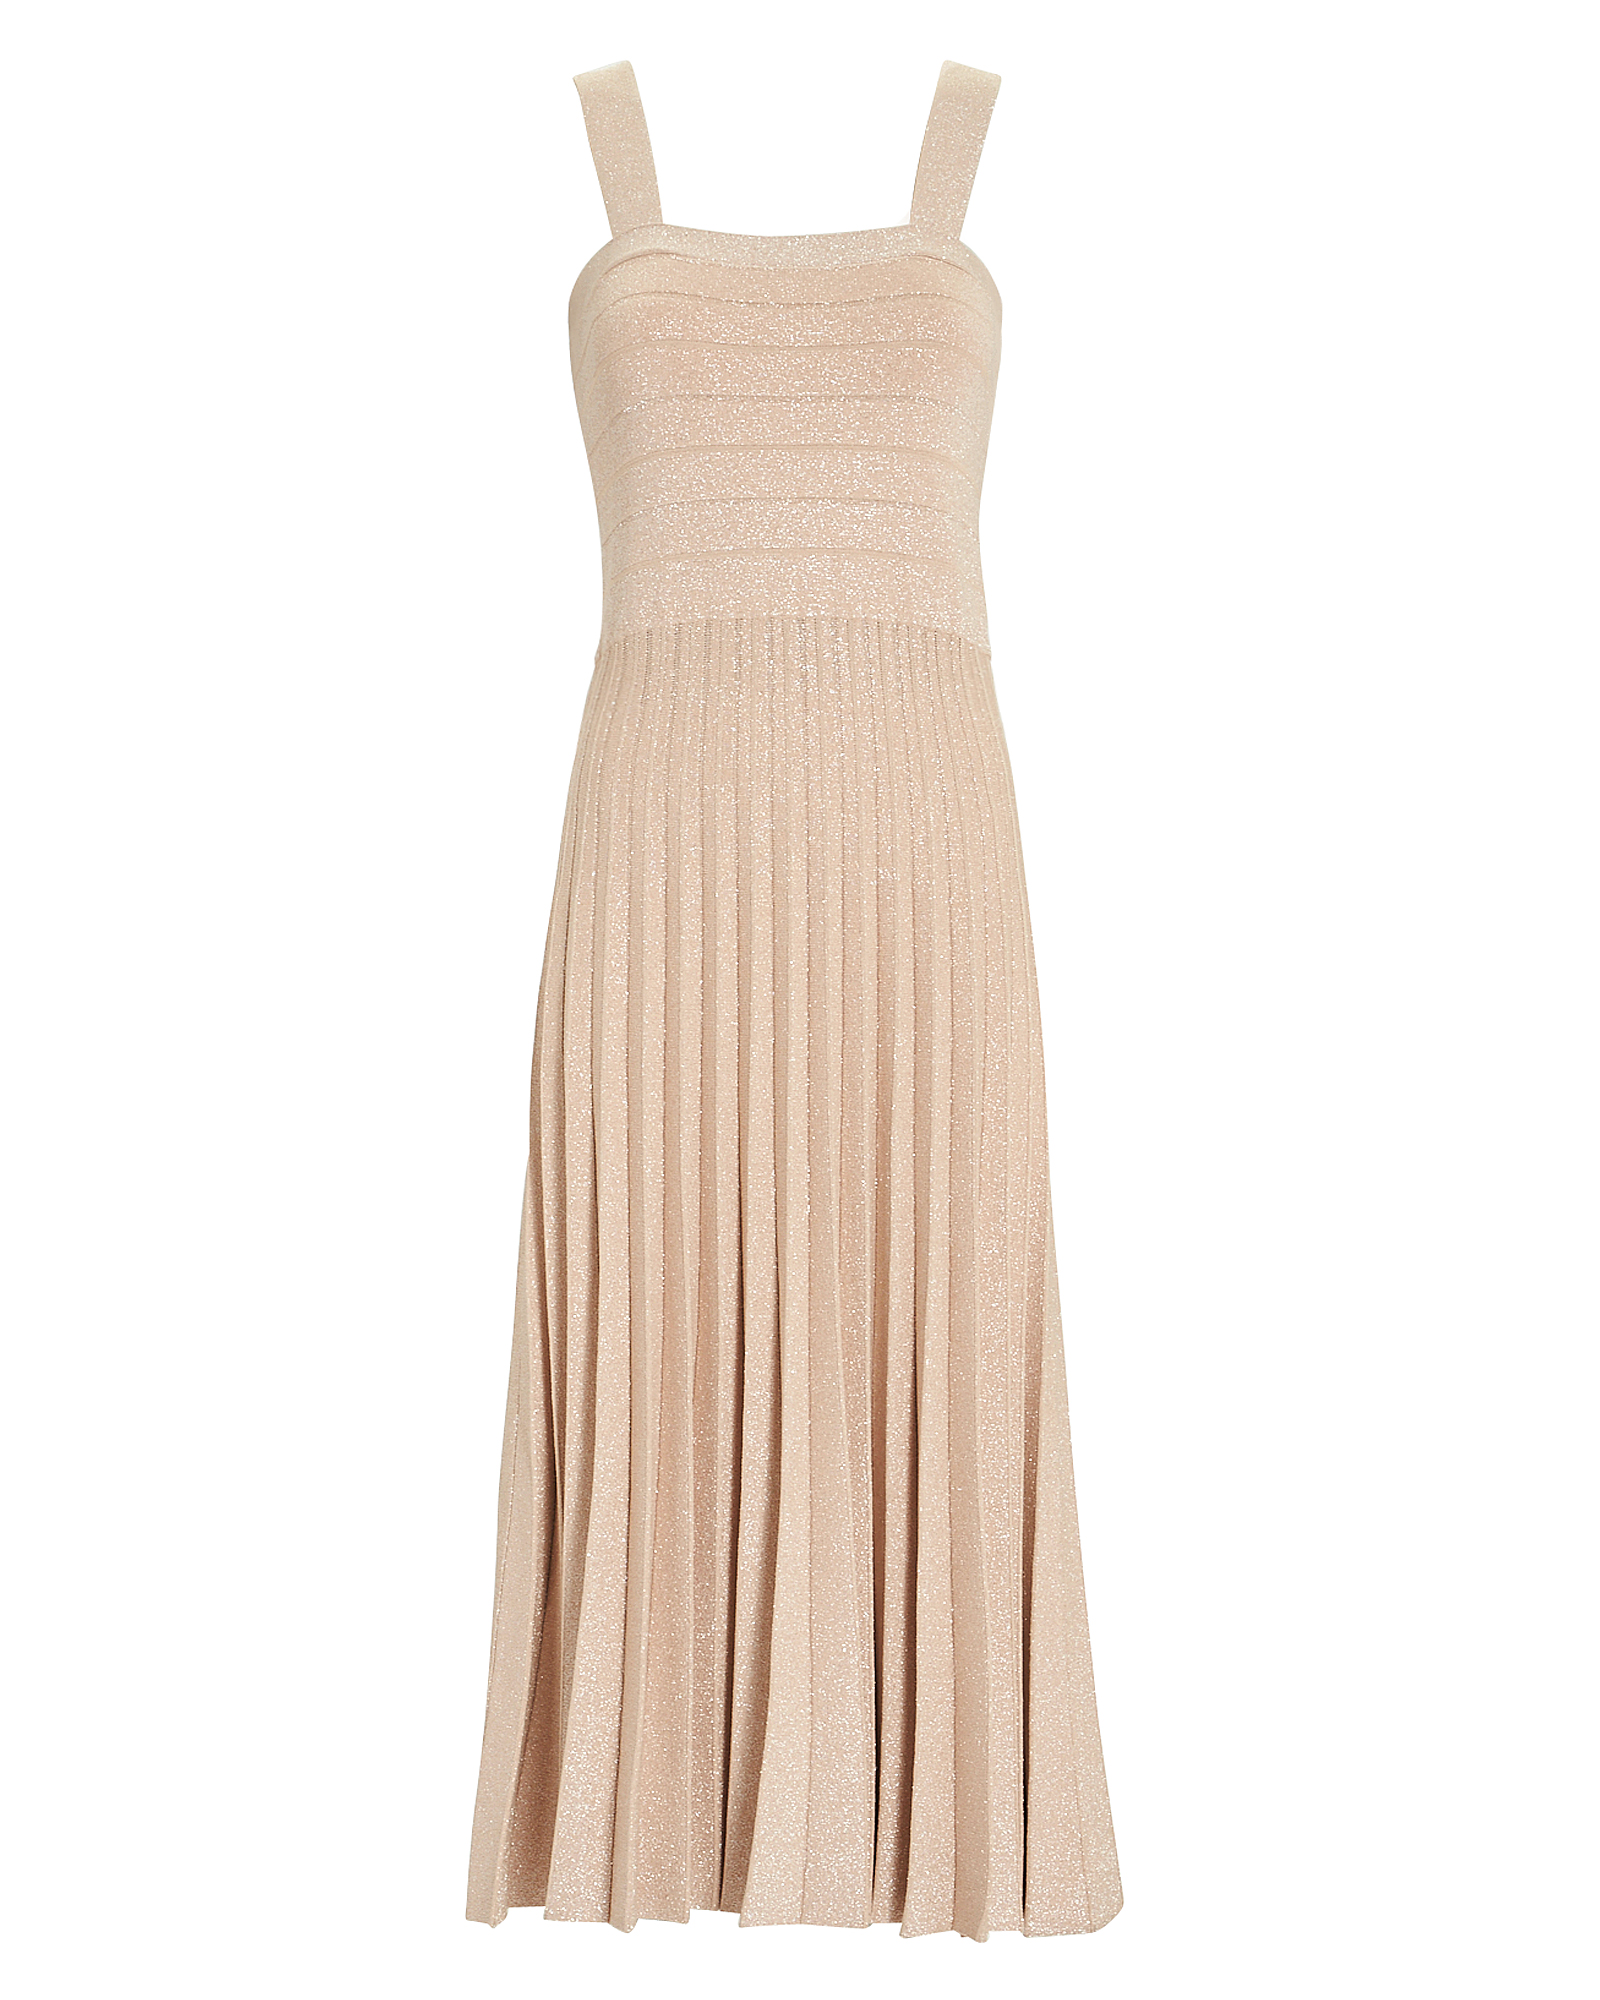 10 CROSBY Pleated Lurex Knit Dress